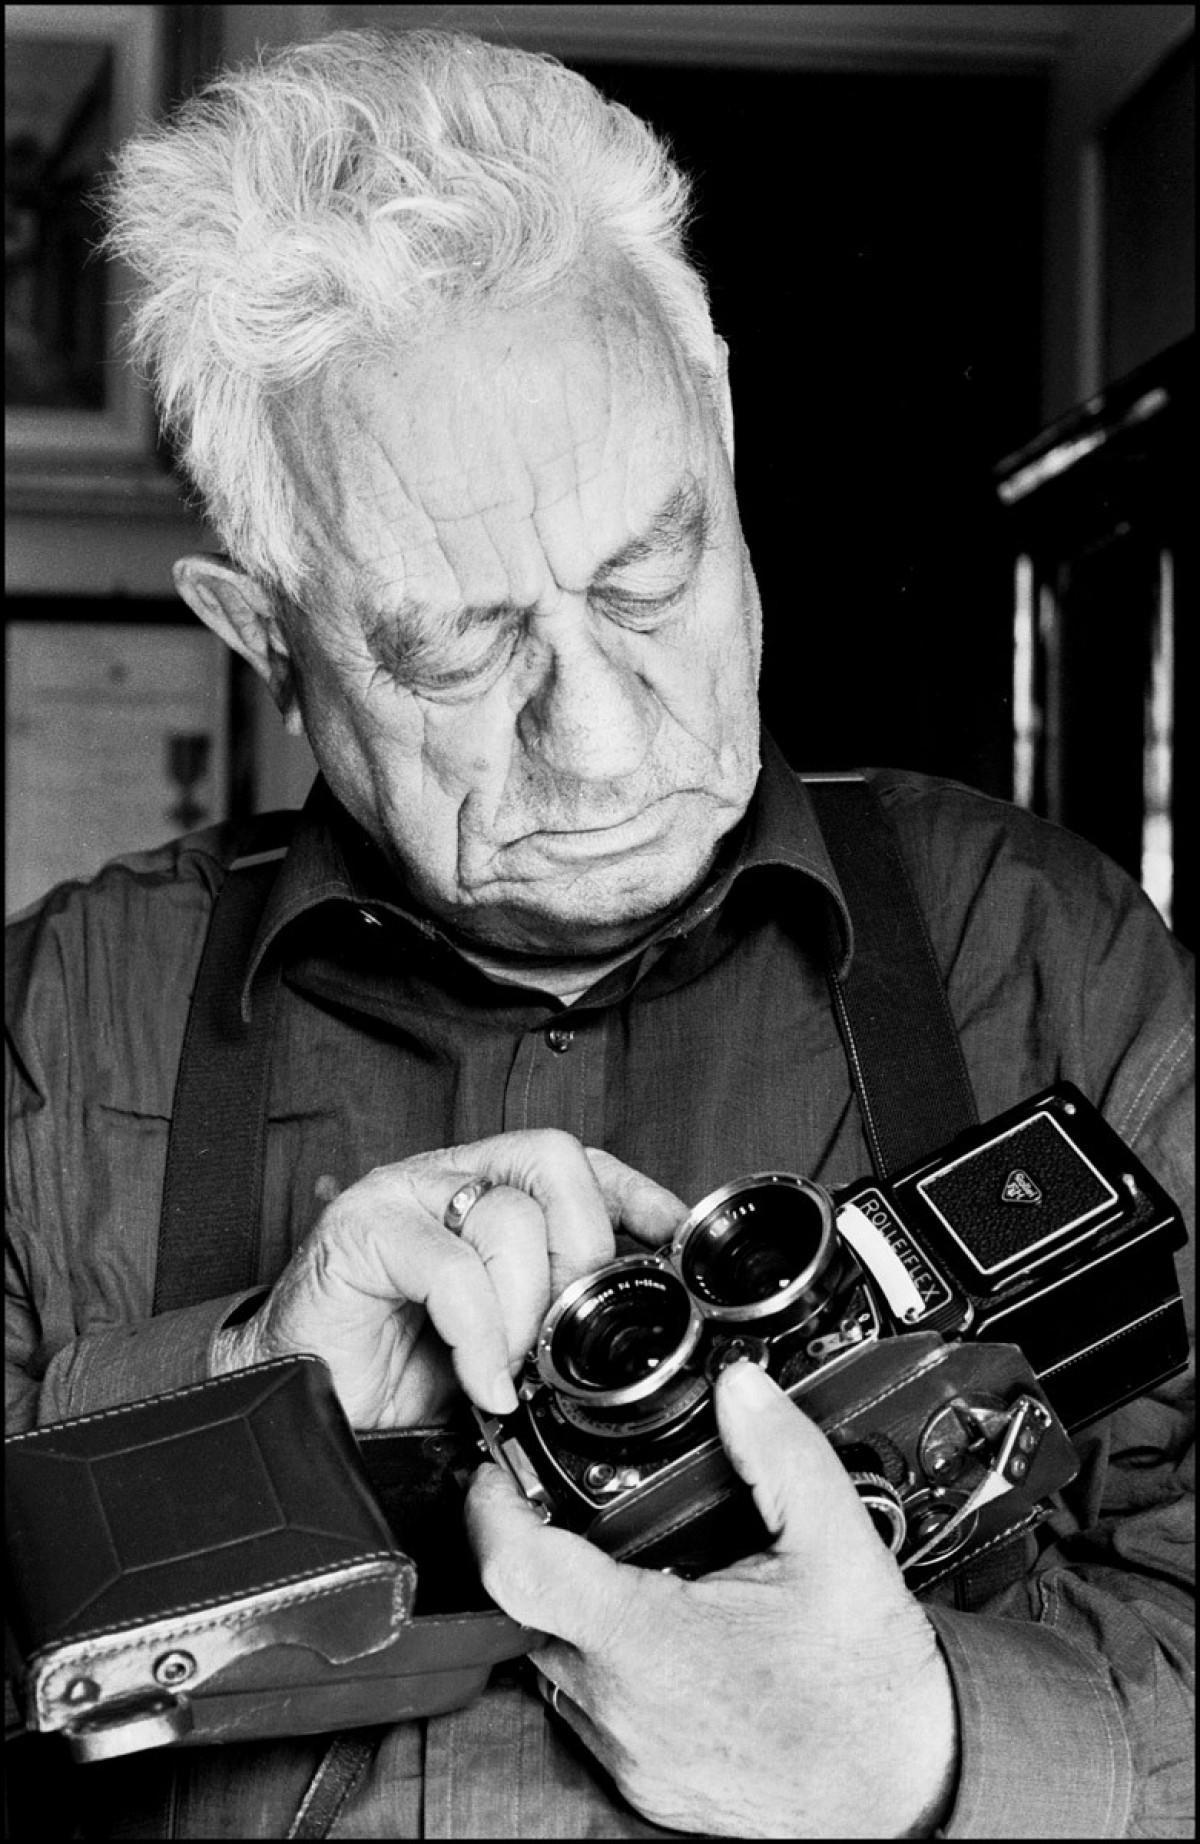 Vistali Piero photographer